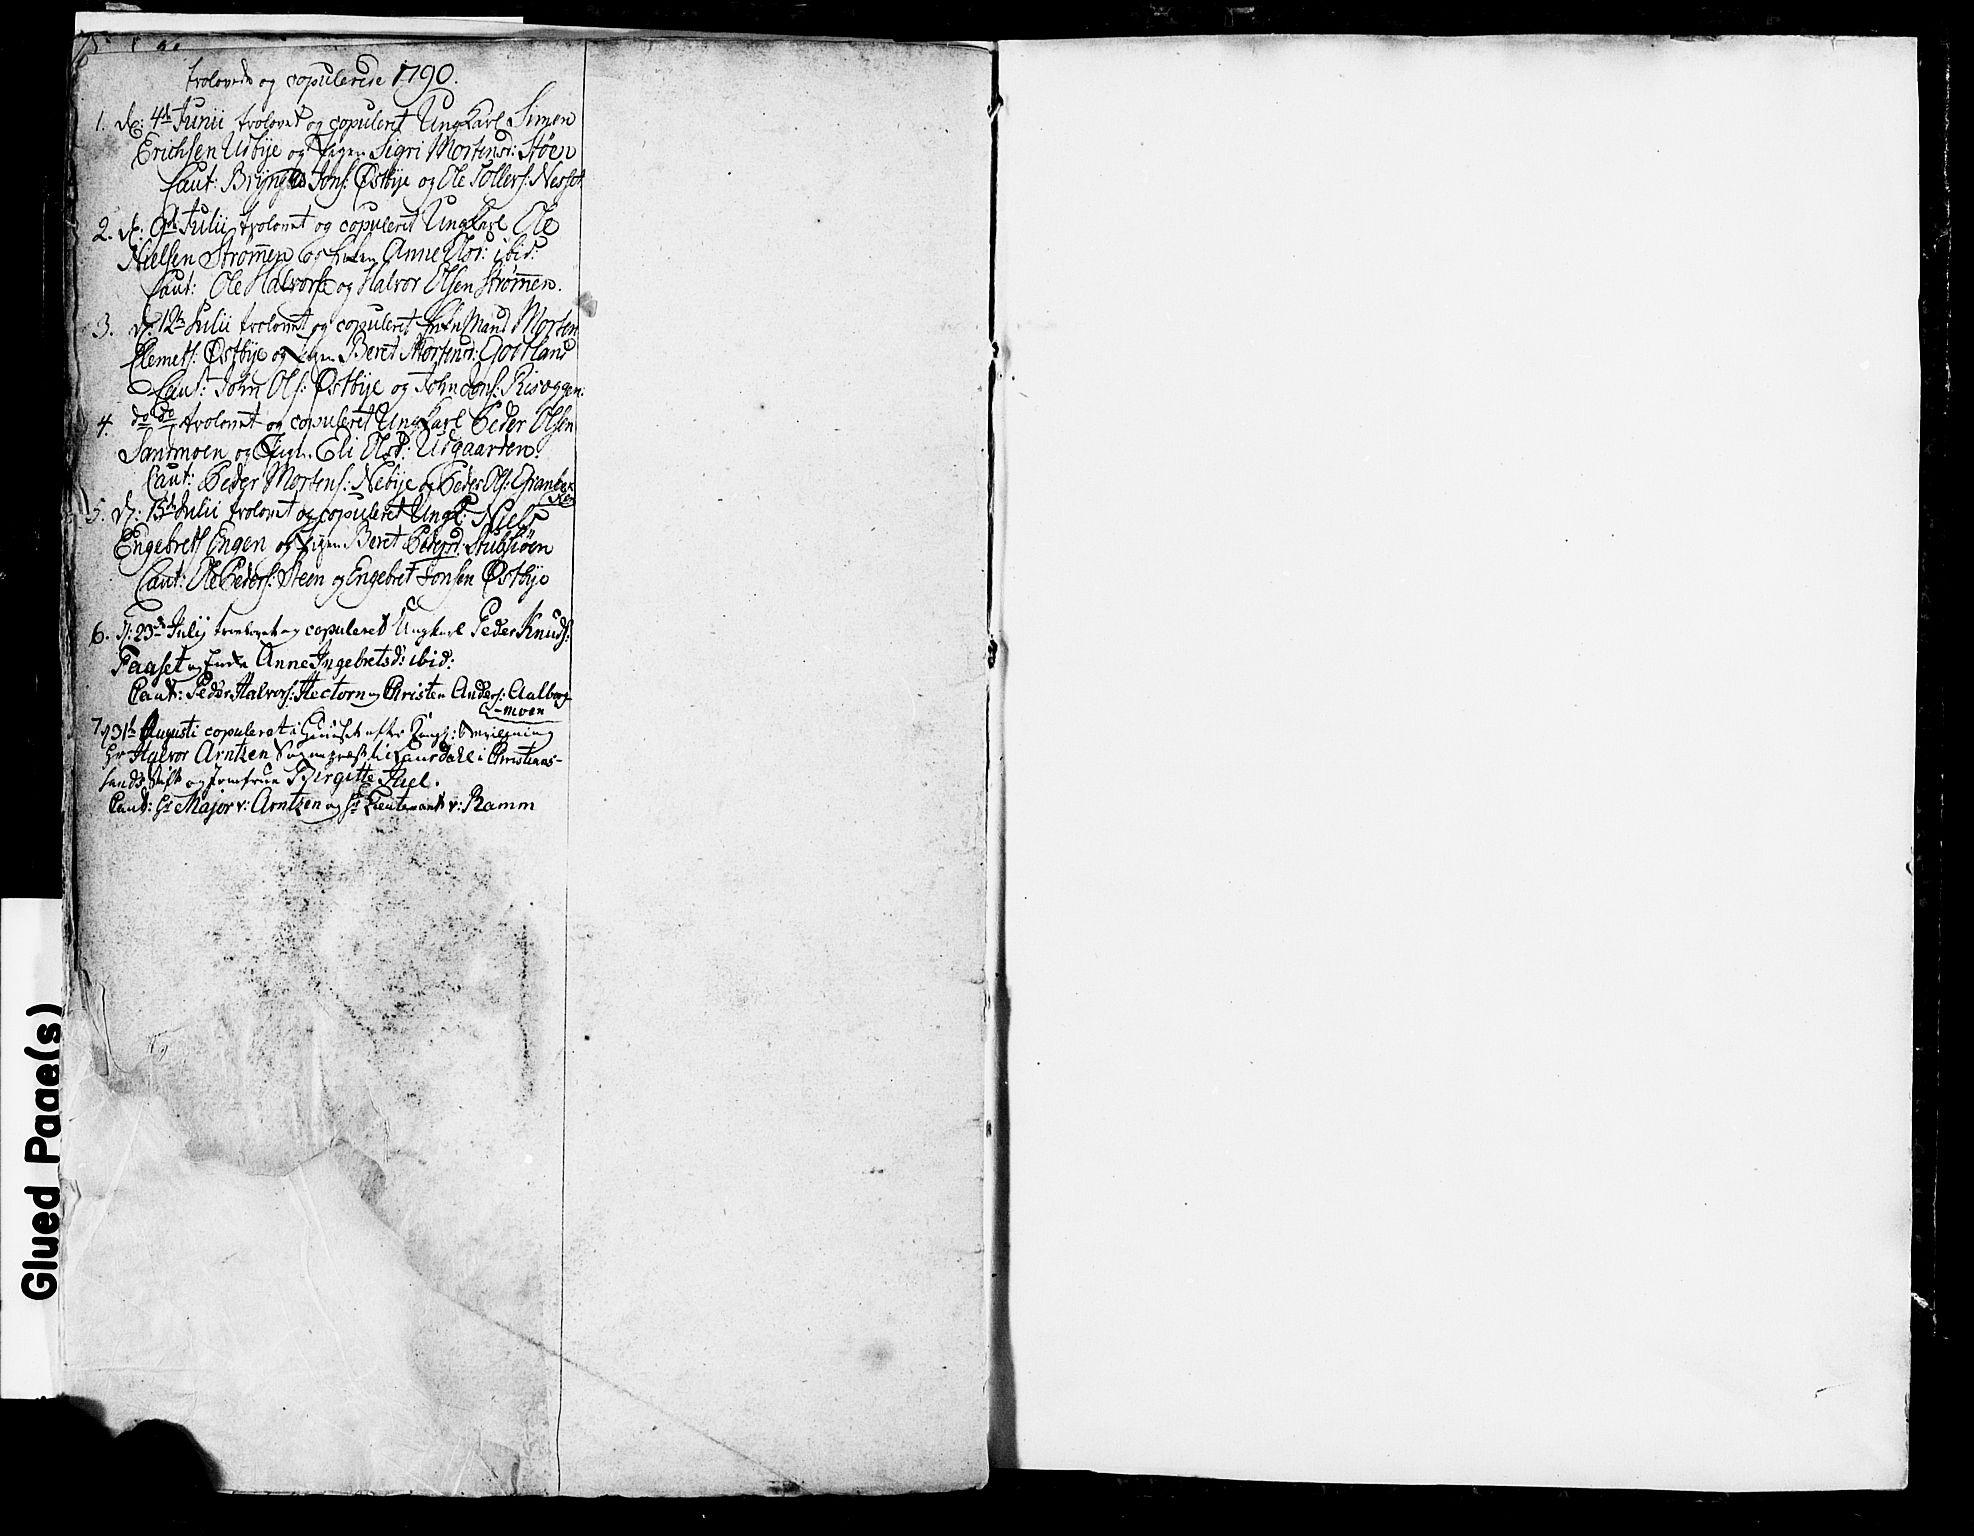 SAH, Tynset prestekontor, Ministerialbok nr. 13, 1784-1790